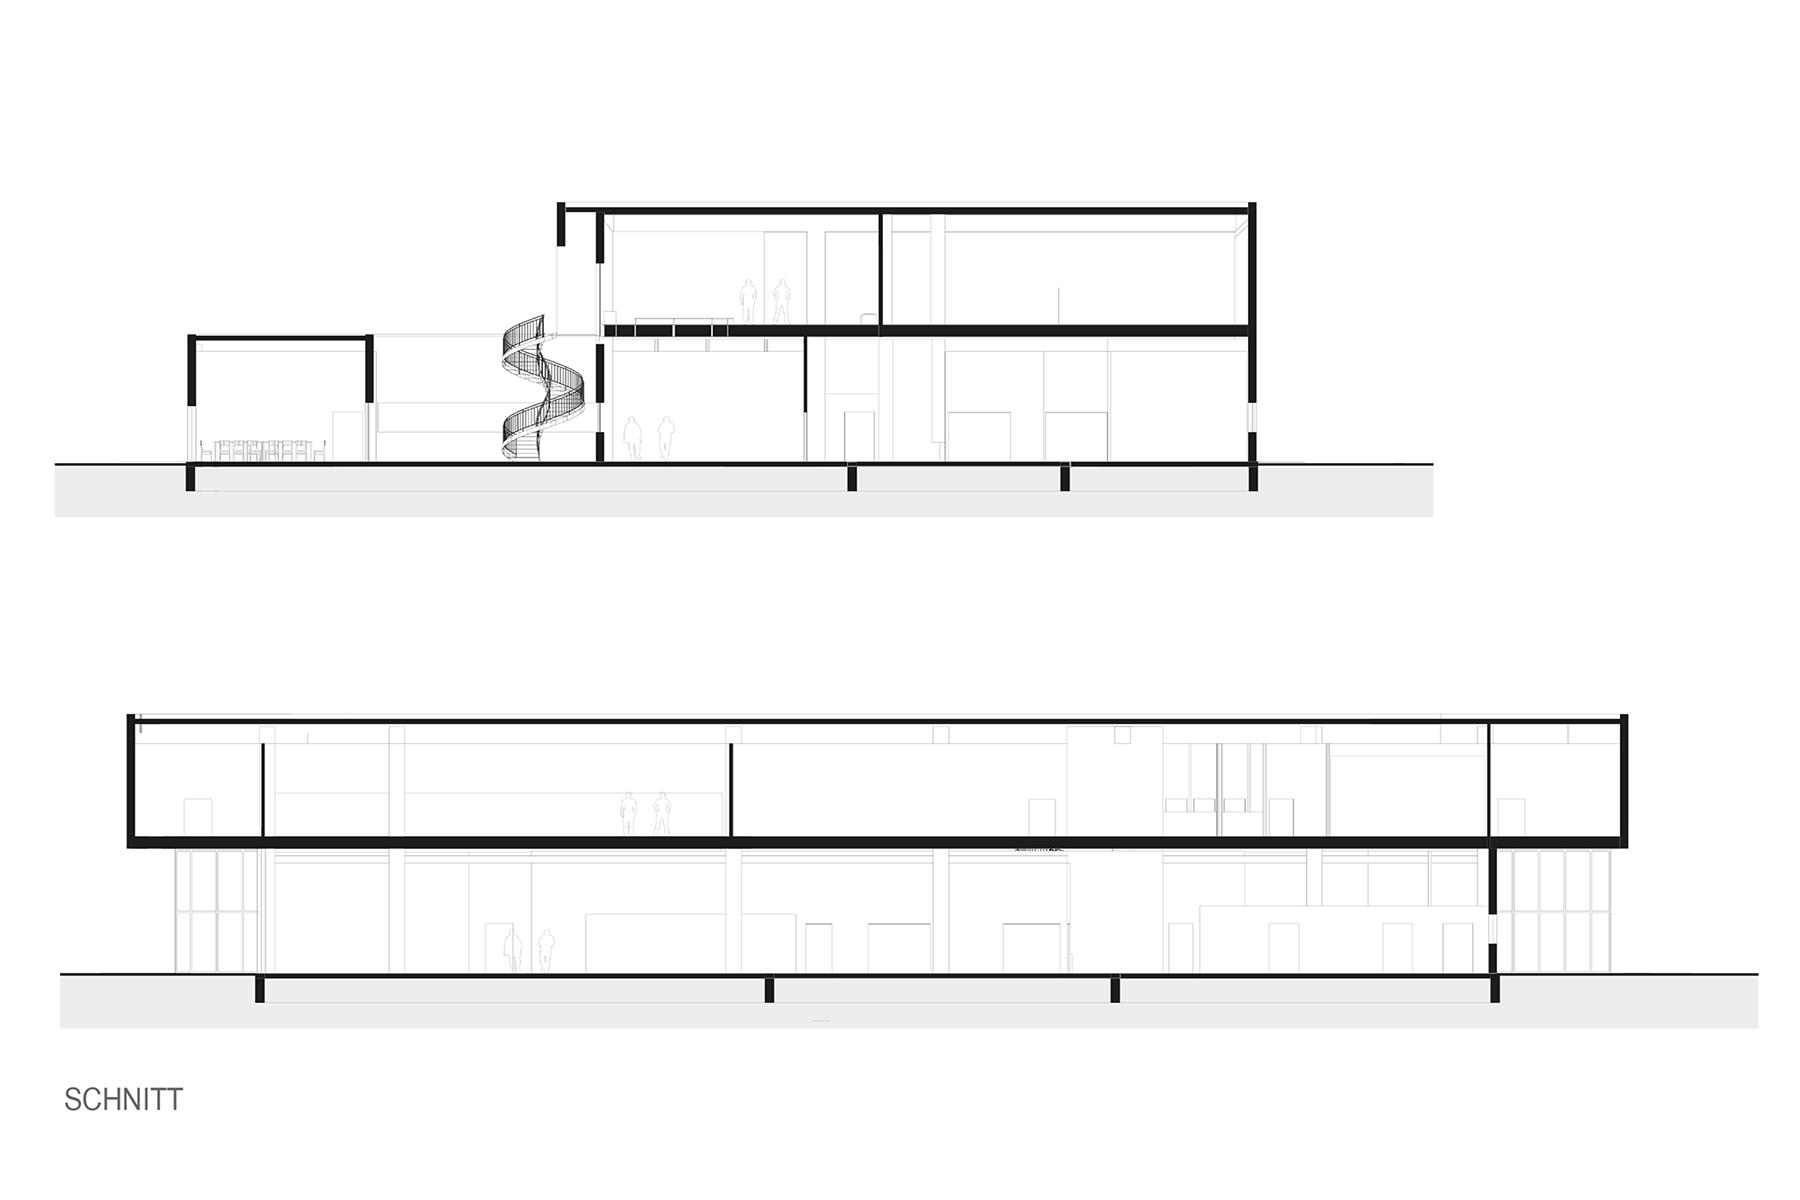 schnitt, Neubau, Firma, Architektur, Produktionsbetrieb, Peaktechnology, Holzhausen, Carbon, Kohlefaser